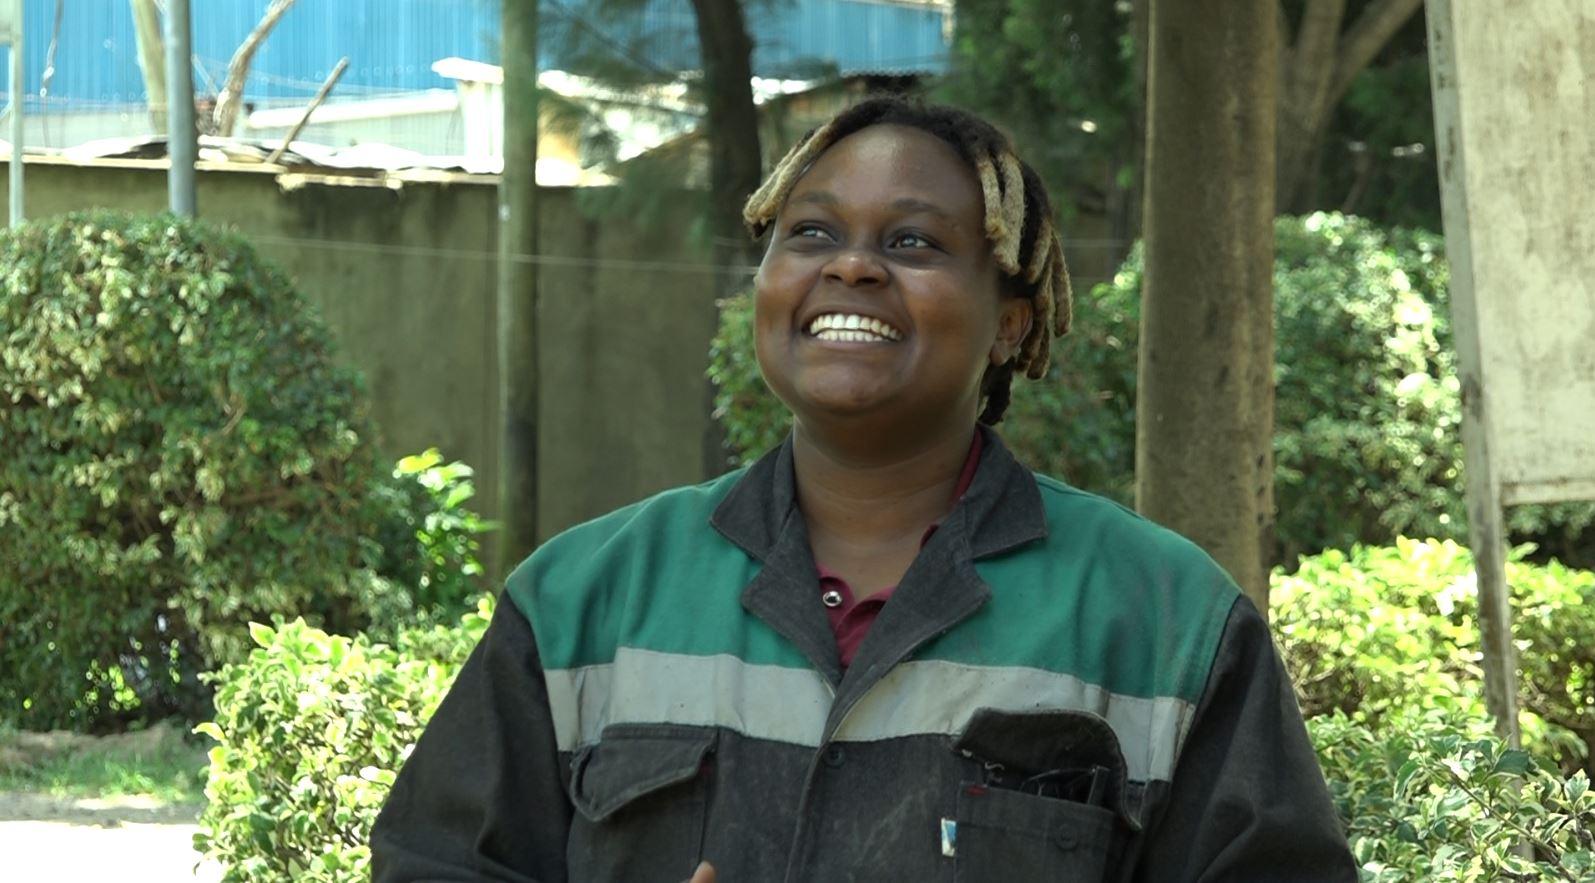 Women Making History: Nzambi Matee – Saving The Environment One Brick At A Time